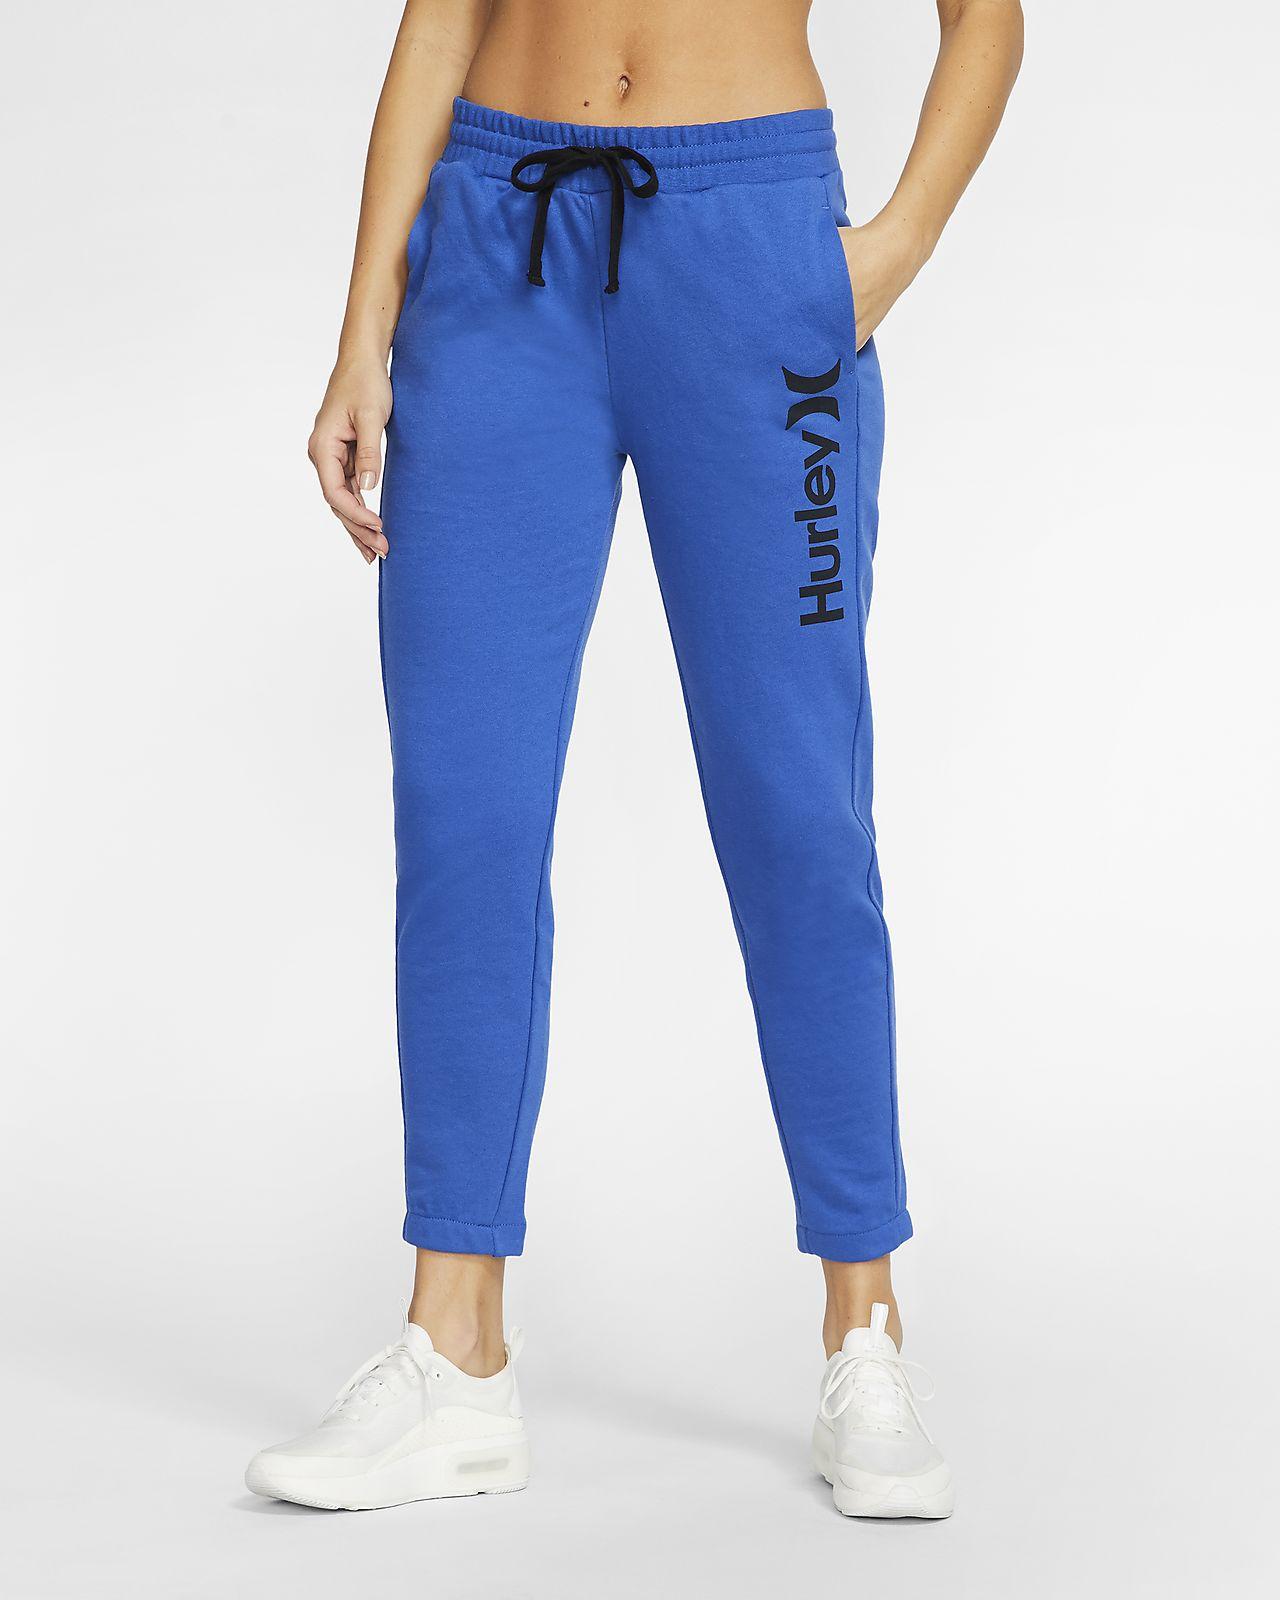 Pantalon de jogging en tissu Fleece Hurley One And Only pour Femme